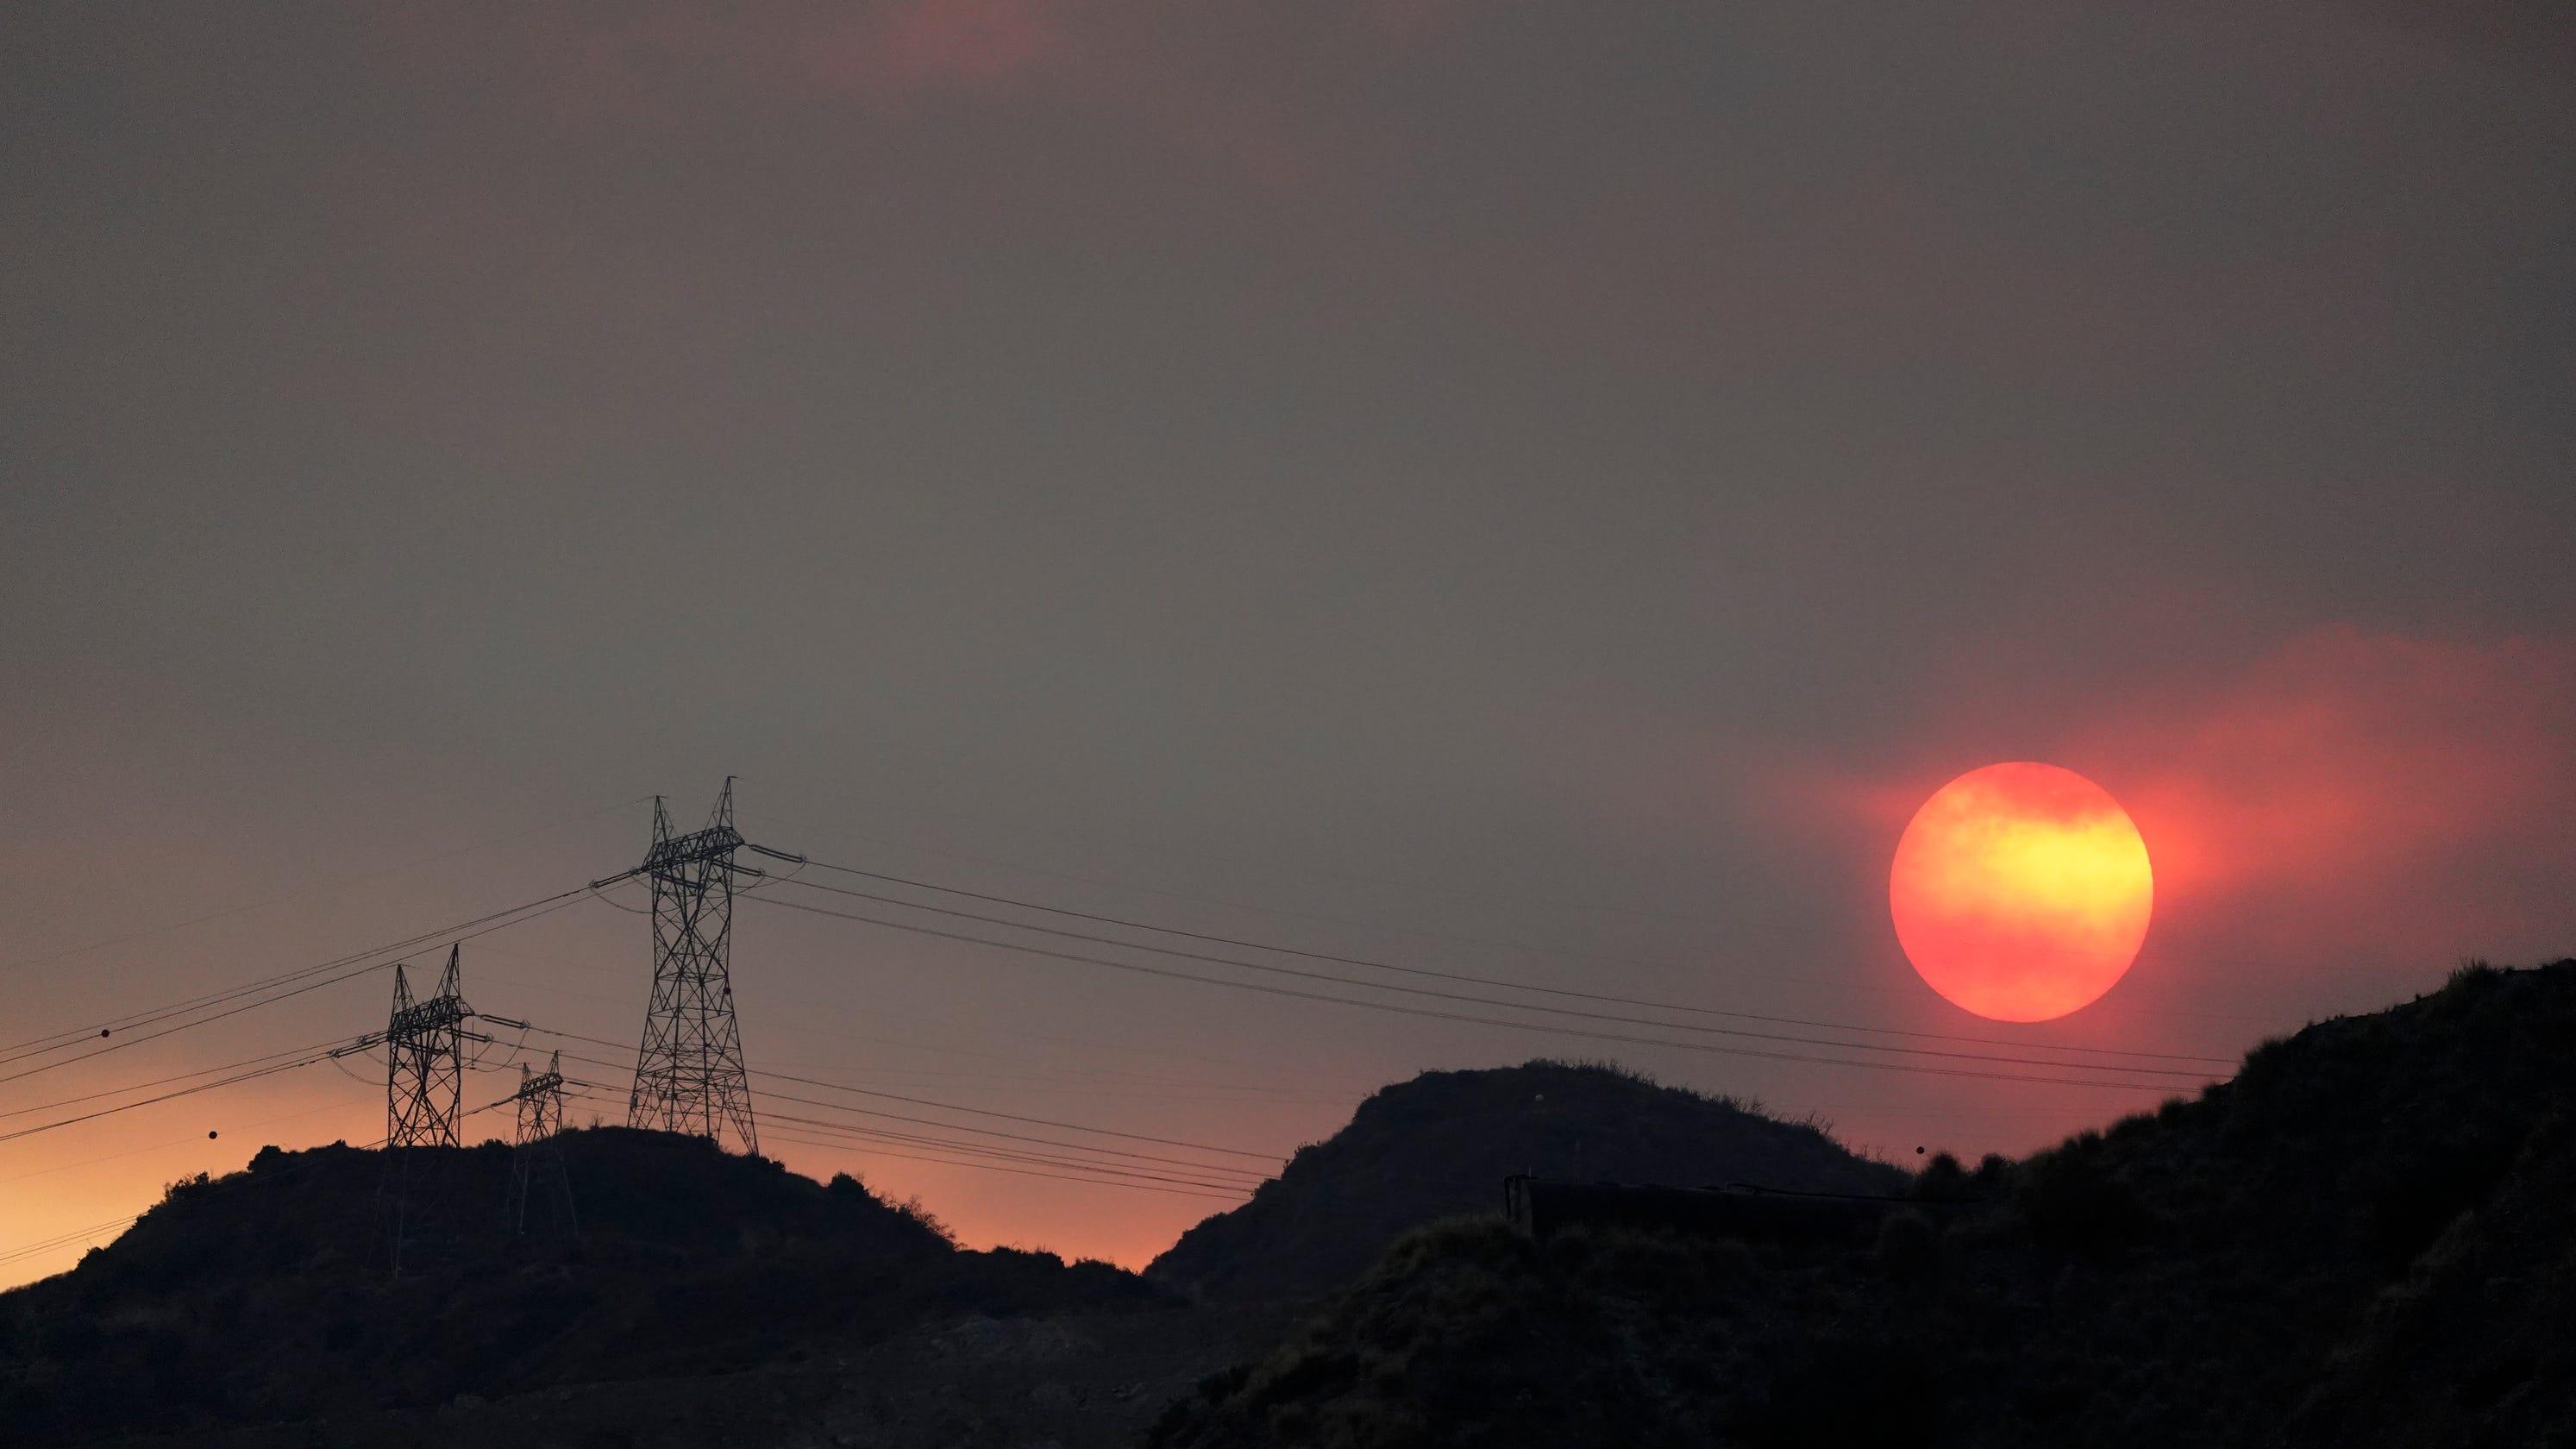 'Dangerous' heat wave scorches western U.S., raising fire threat and coronavirus concerns